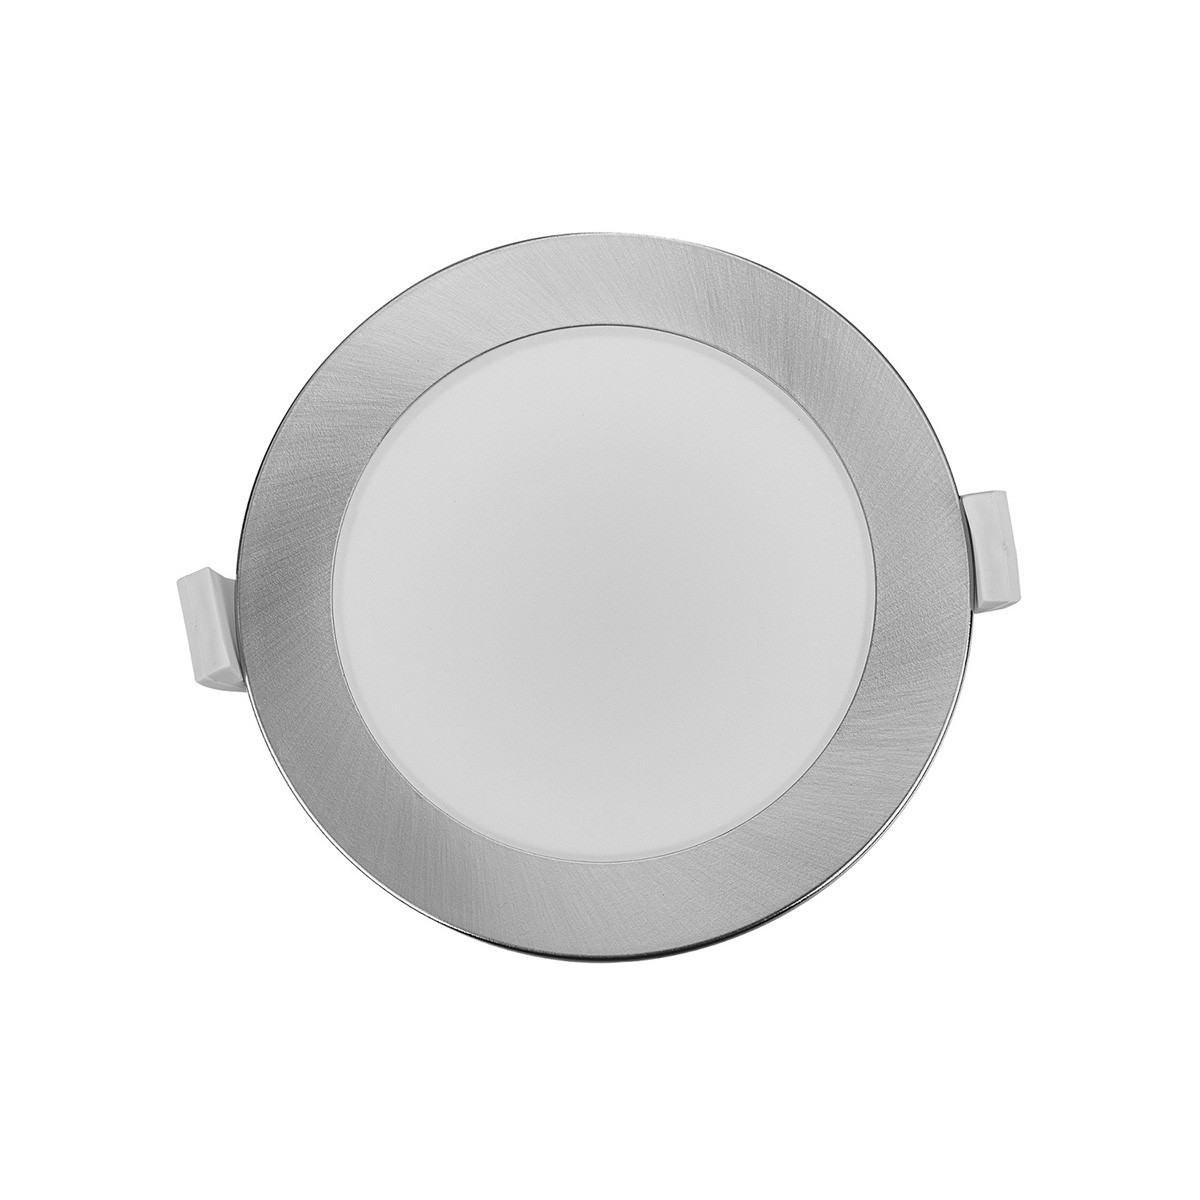 Kato LED Downlight, Nickel